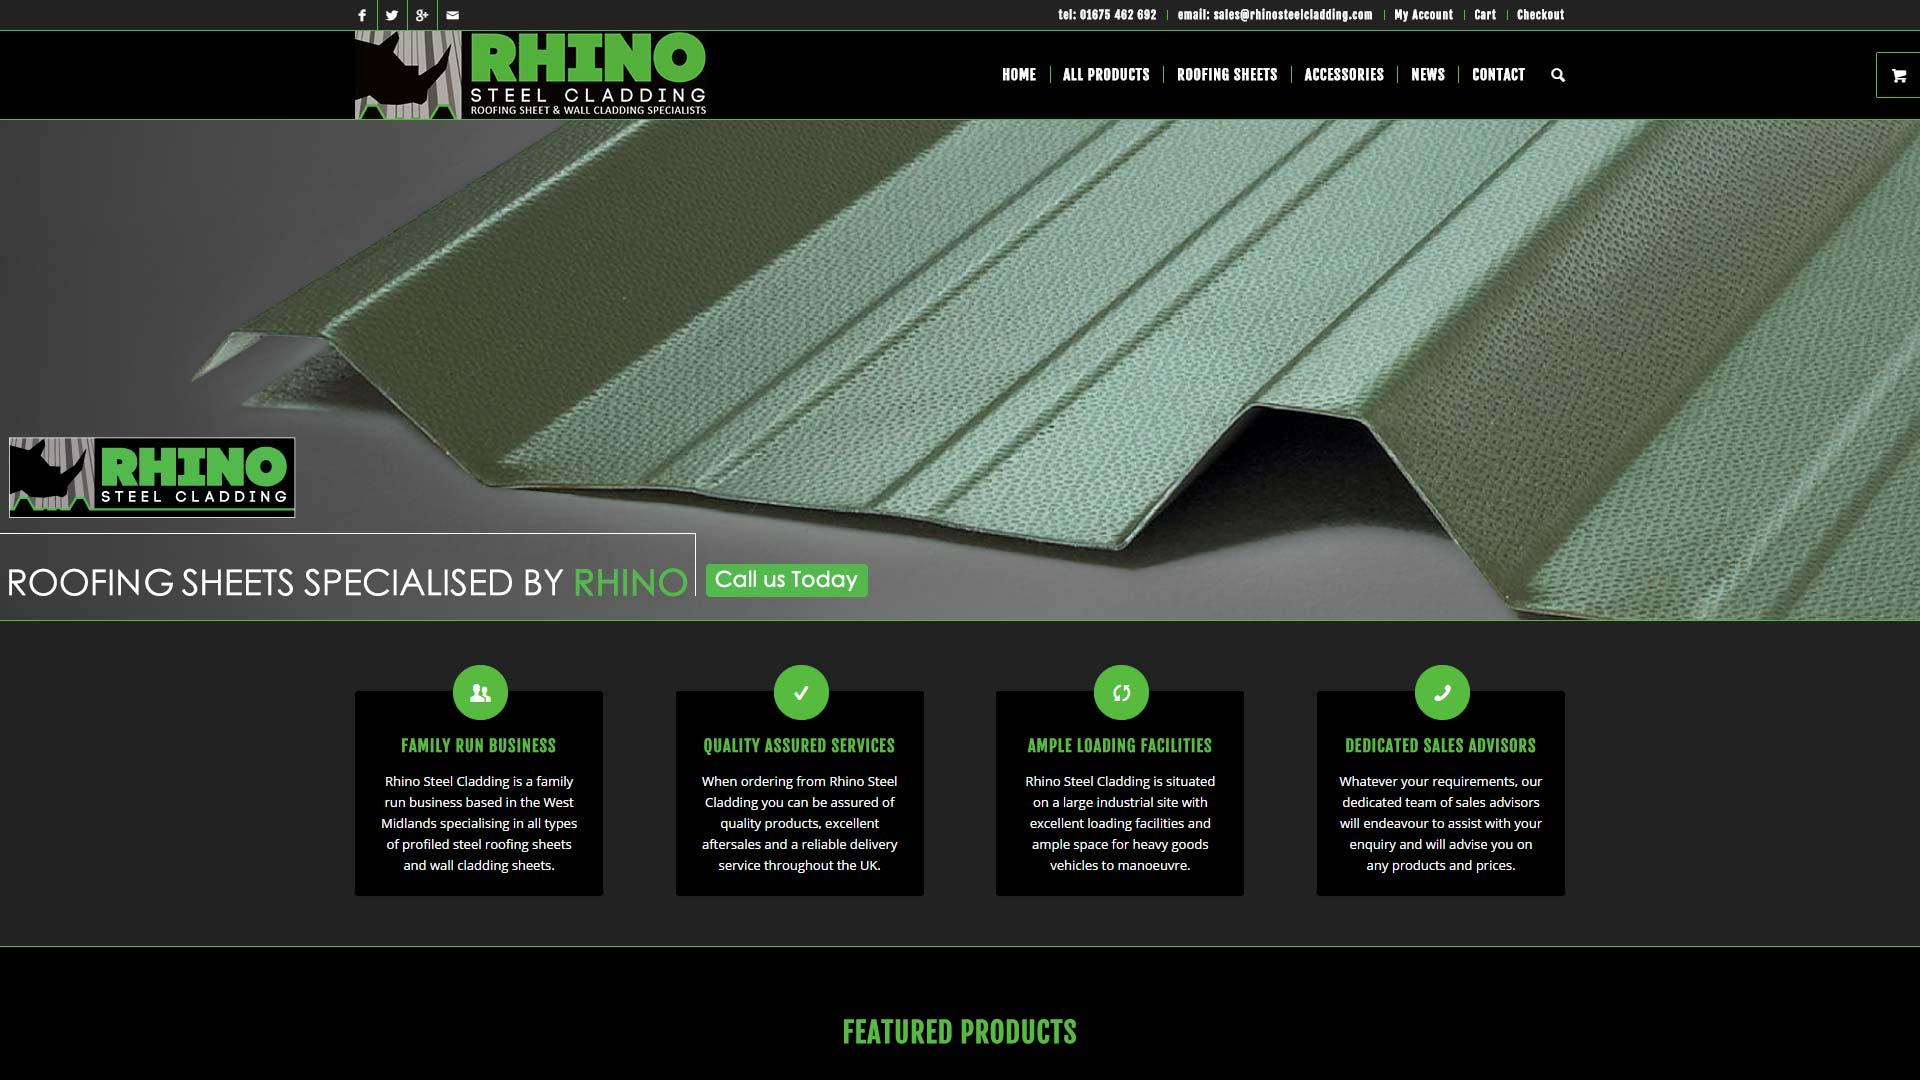 Rhino Steel Cladding